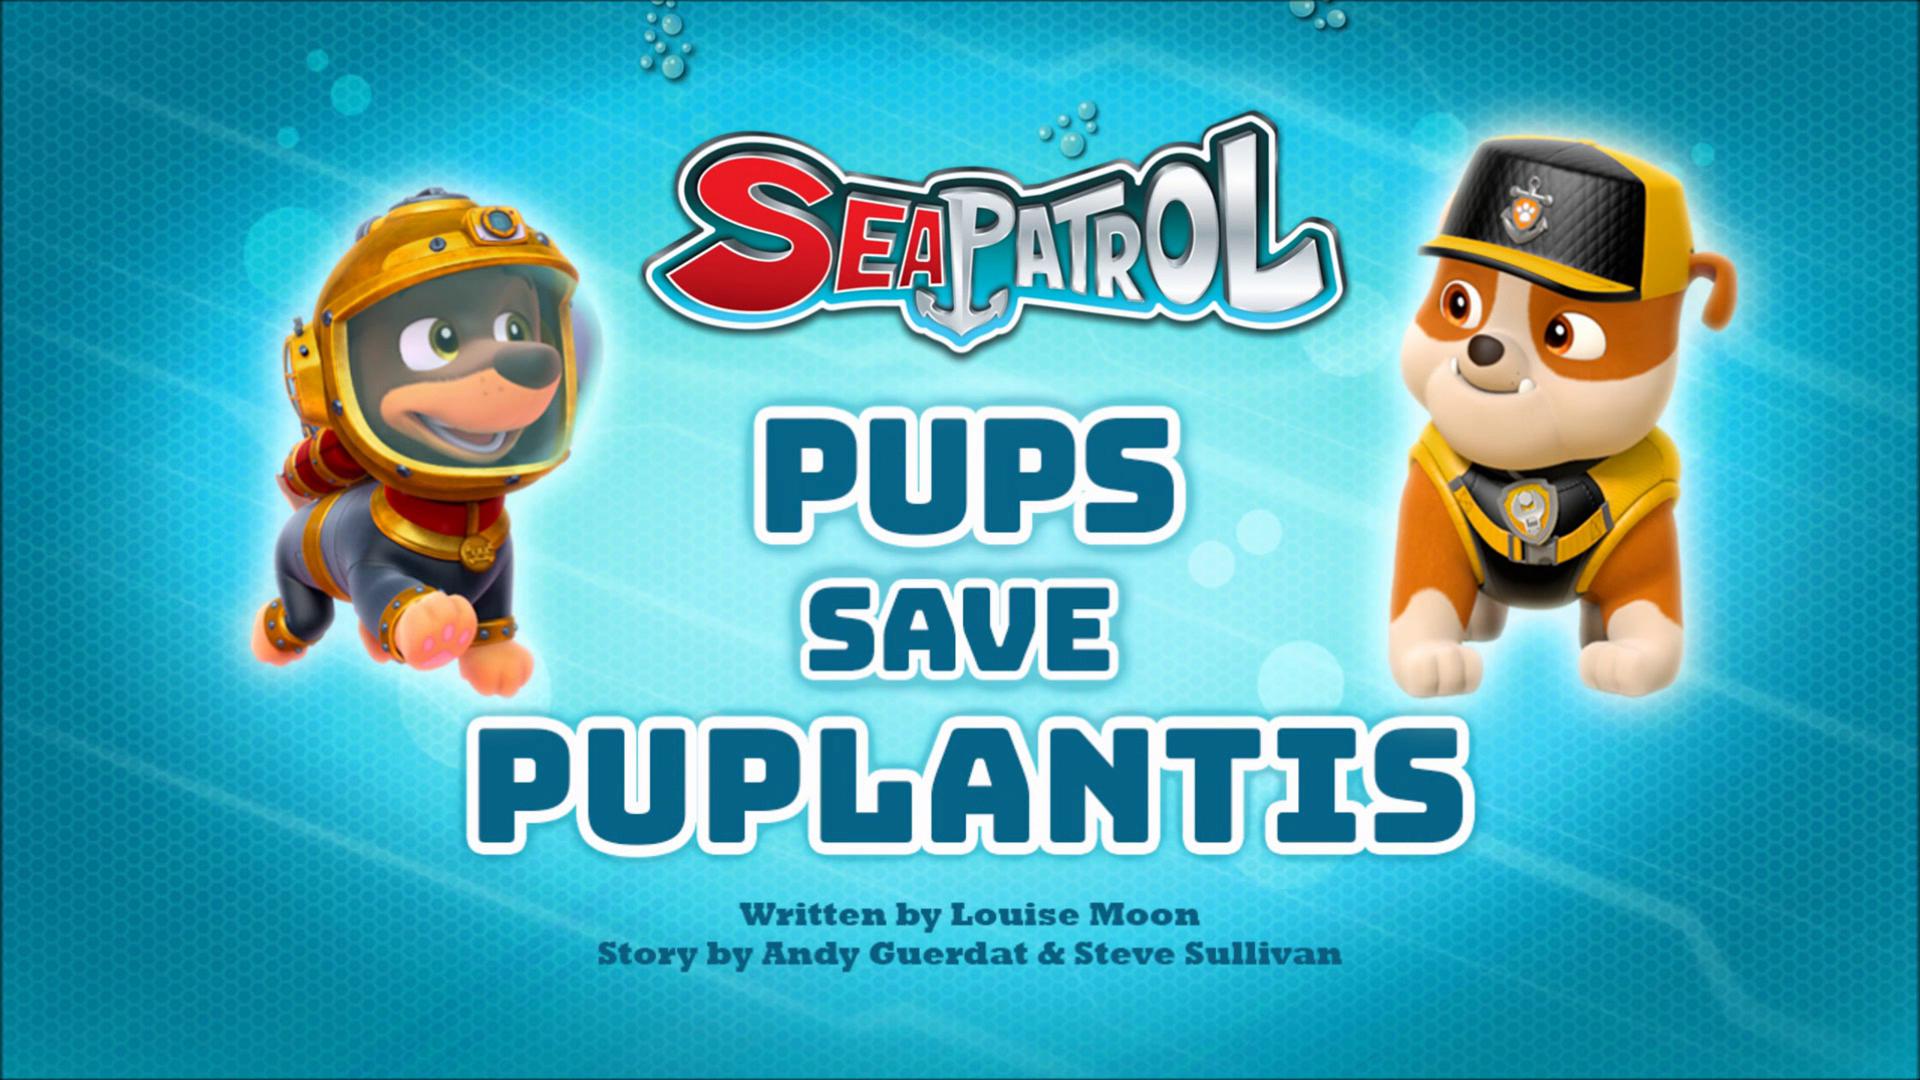 Sea Patrol: Pups Save Puplantis | PAW Patrol Wiki | FANDOM powered